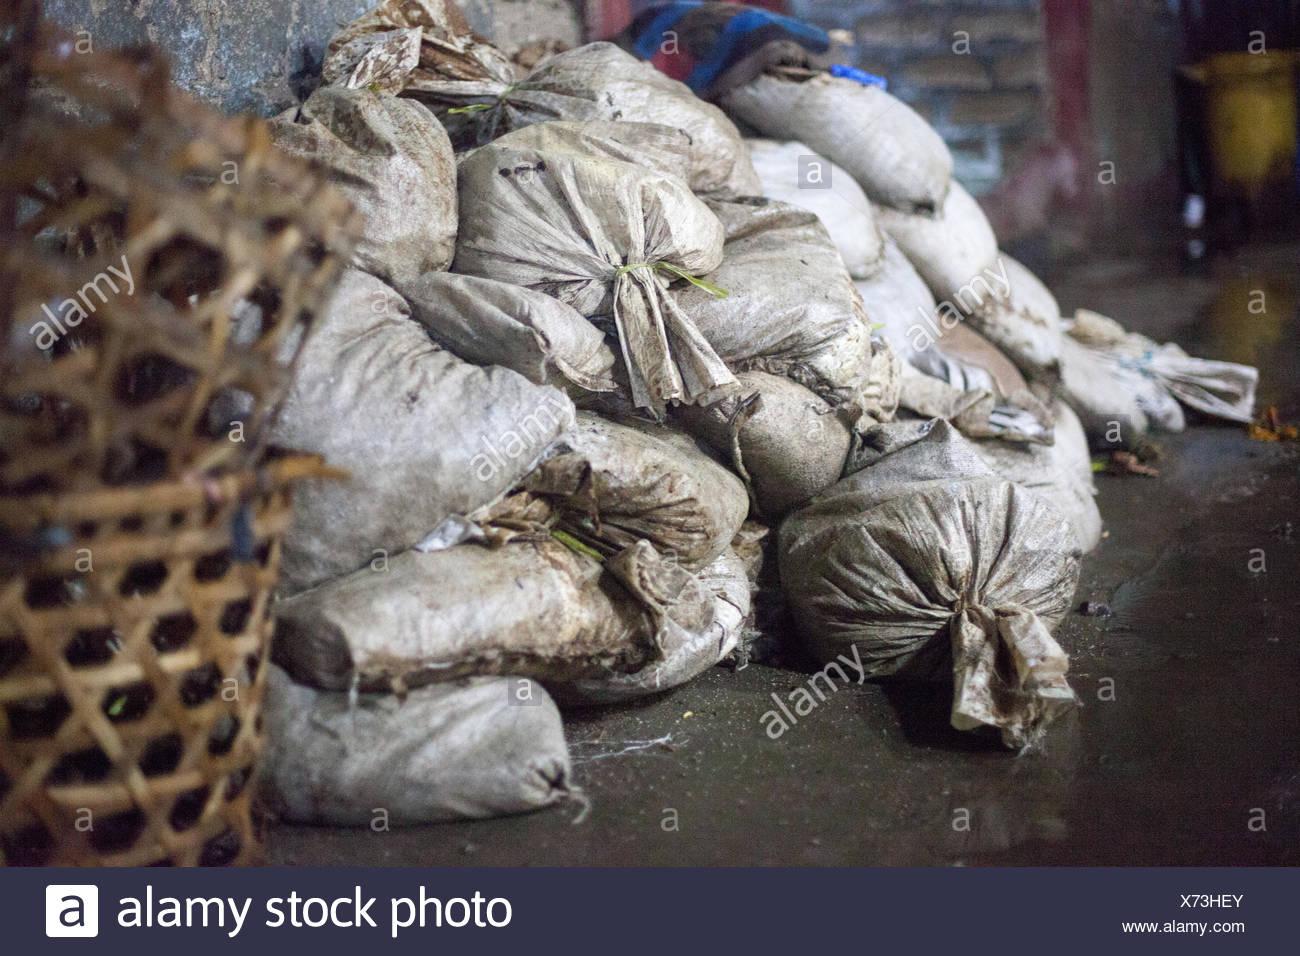 Heap Of Dirty Sacks - Stock Image